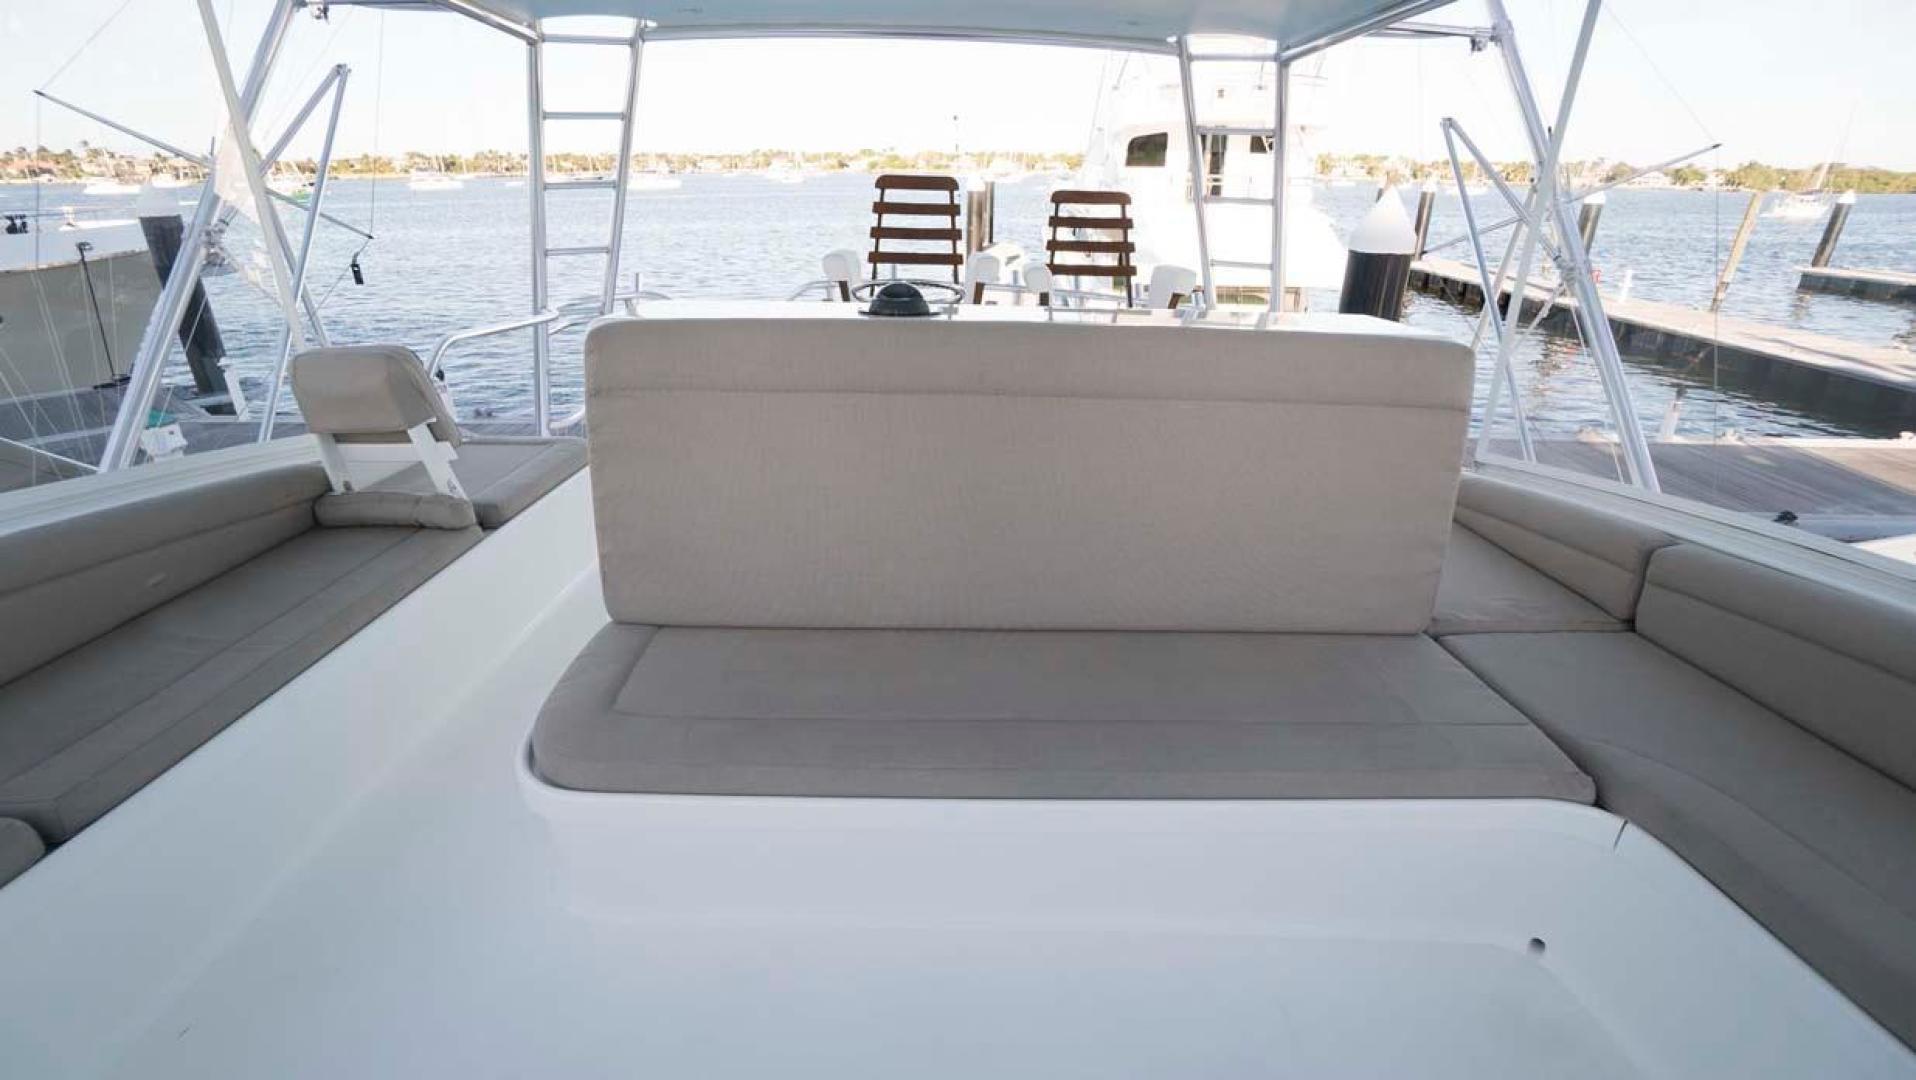 Jim-Smith-Custom-Convertible-Sportfish-2006-Silky-Palm-Beach-Florida-United-States-Flybridge-Seating-Fwd-924612